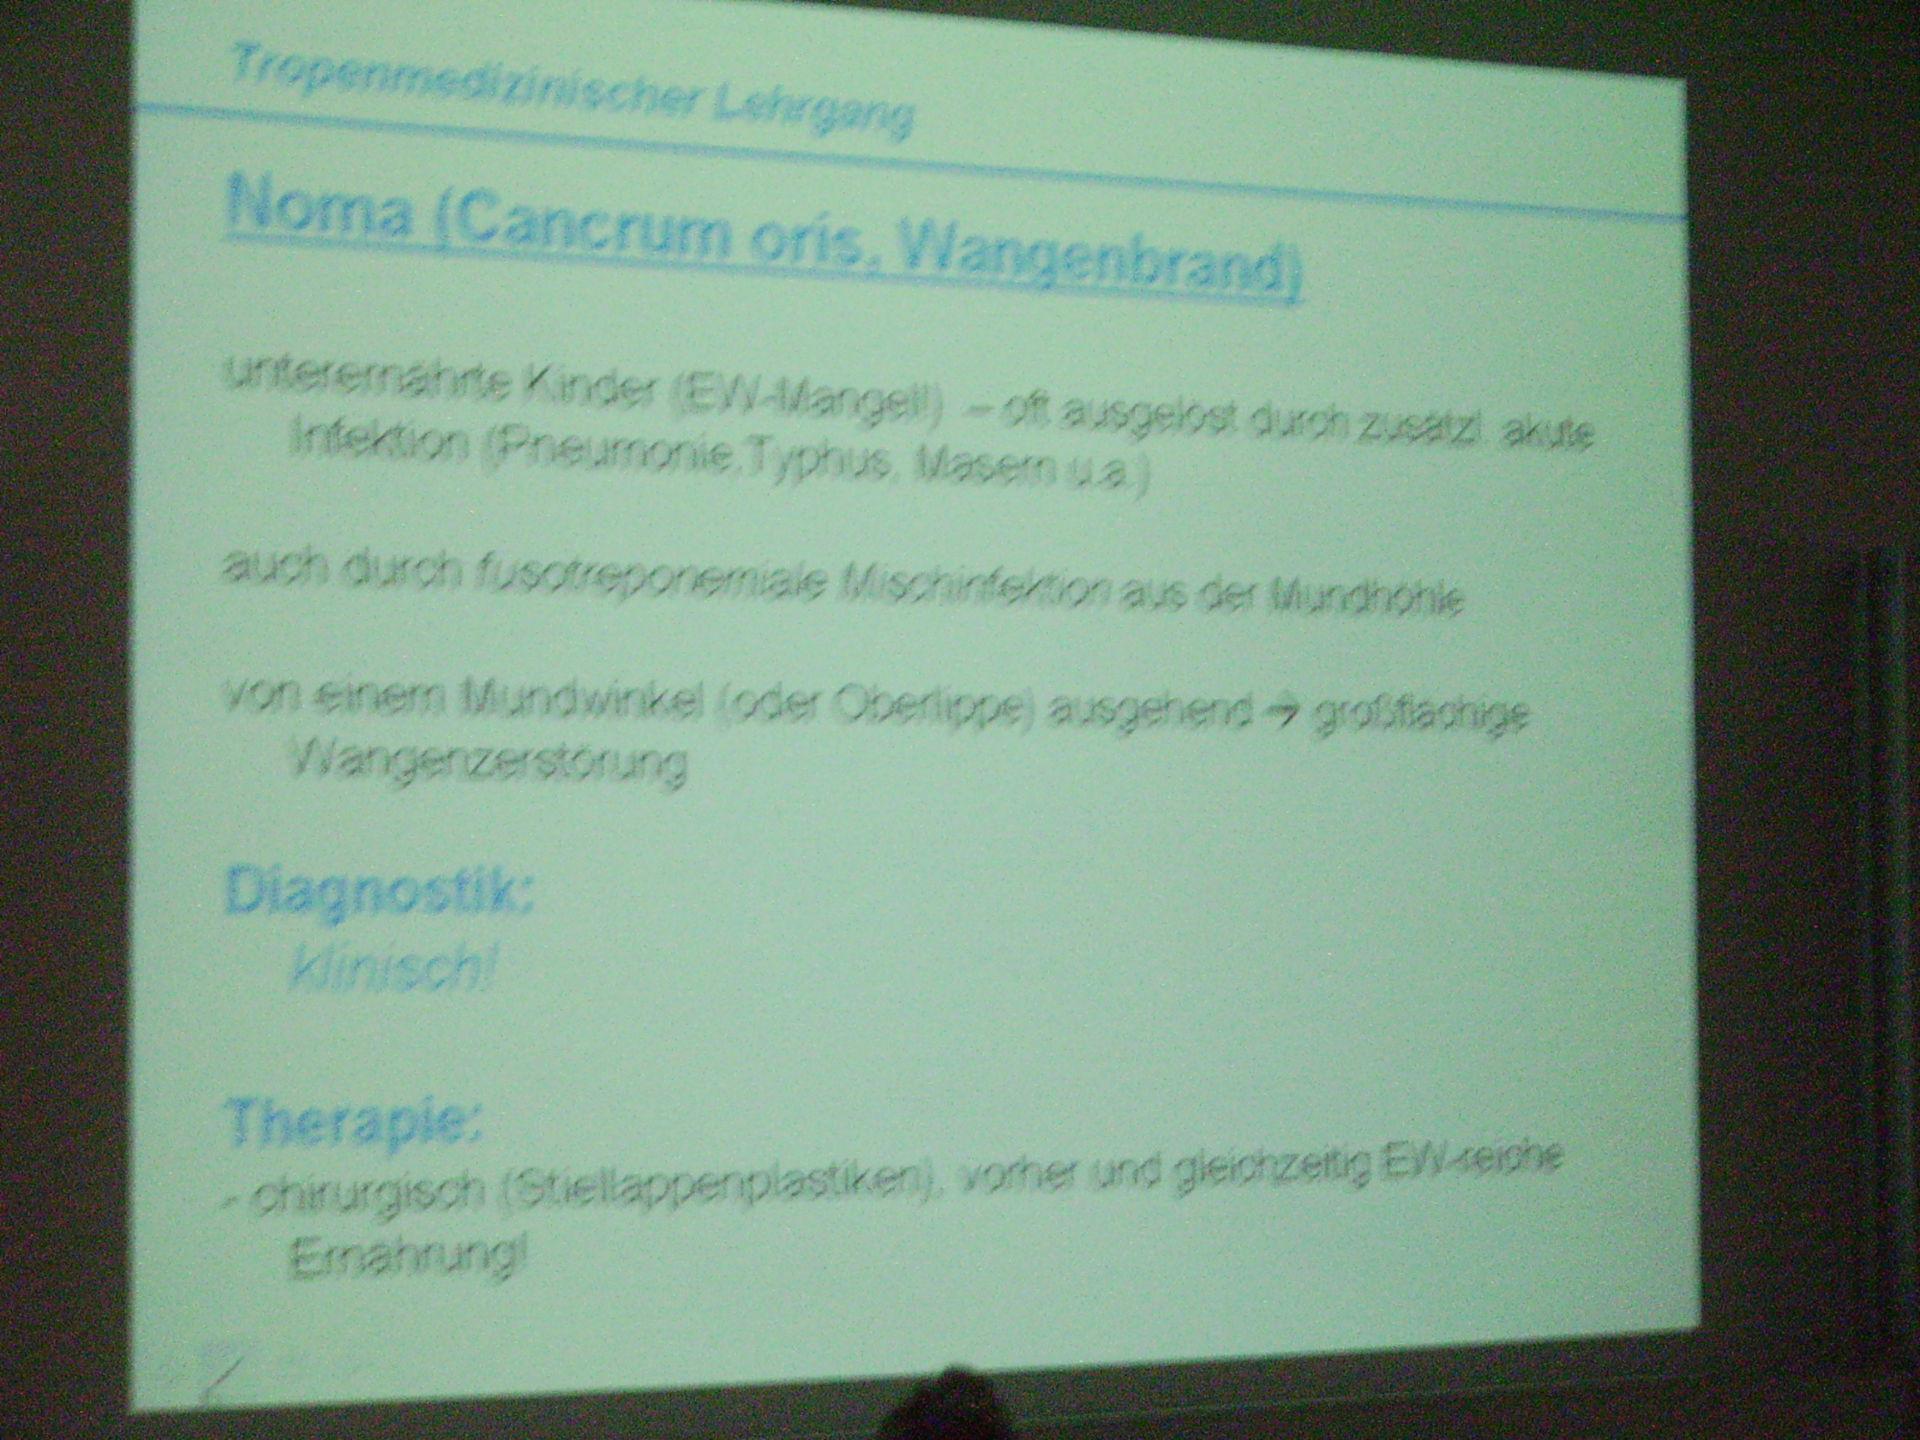 Tropical Medical Training Leipzig